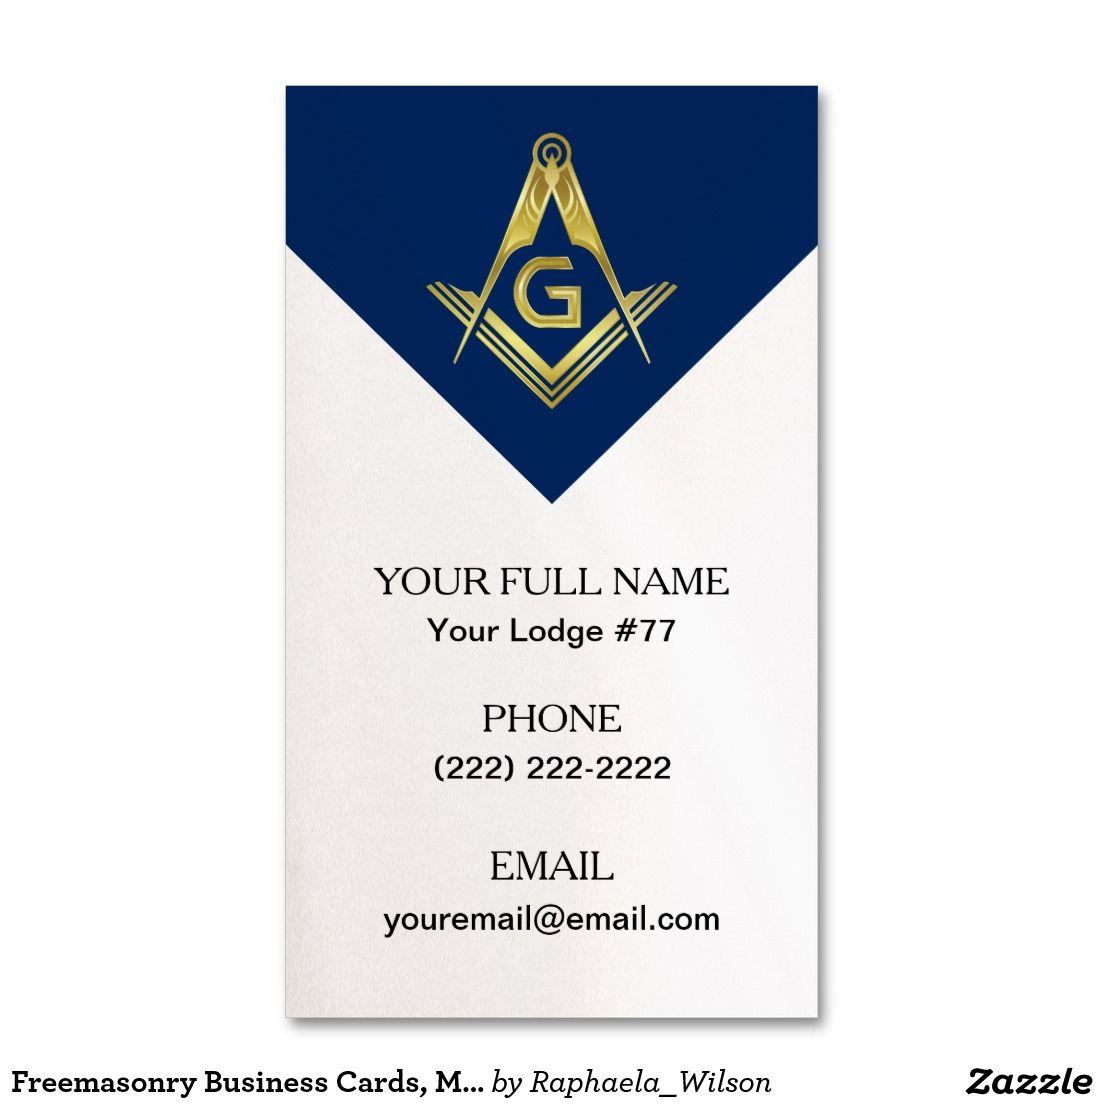 Freemasonry Business Cards, Masonic Blue Navy Gold Business Card